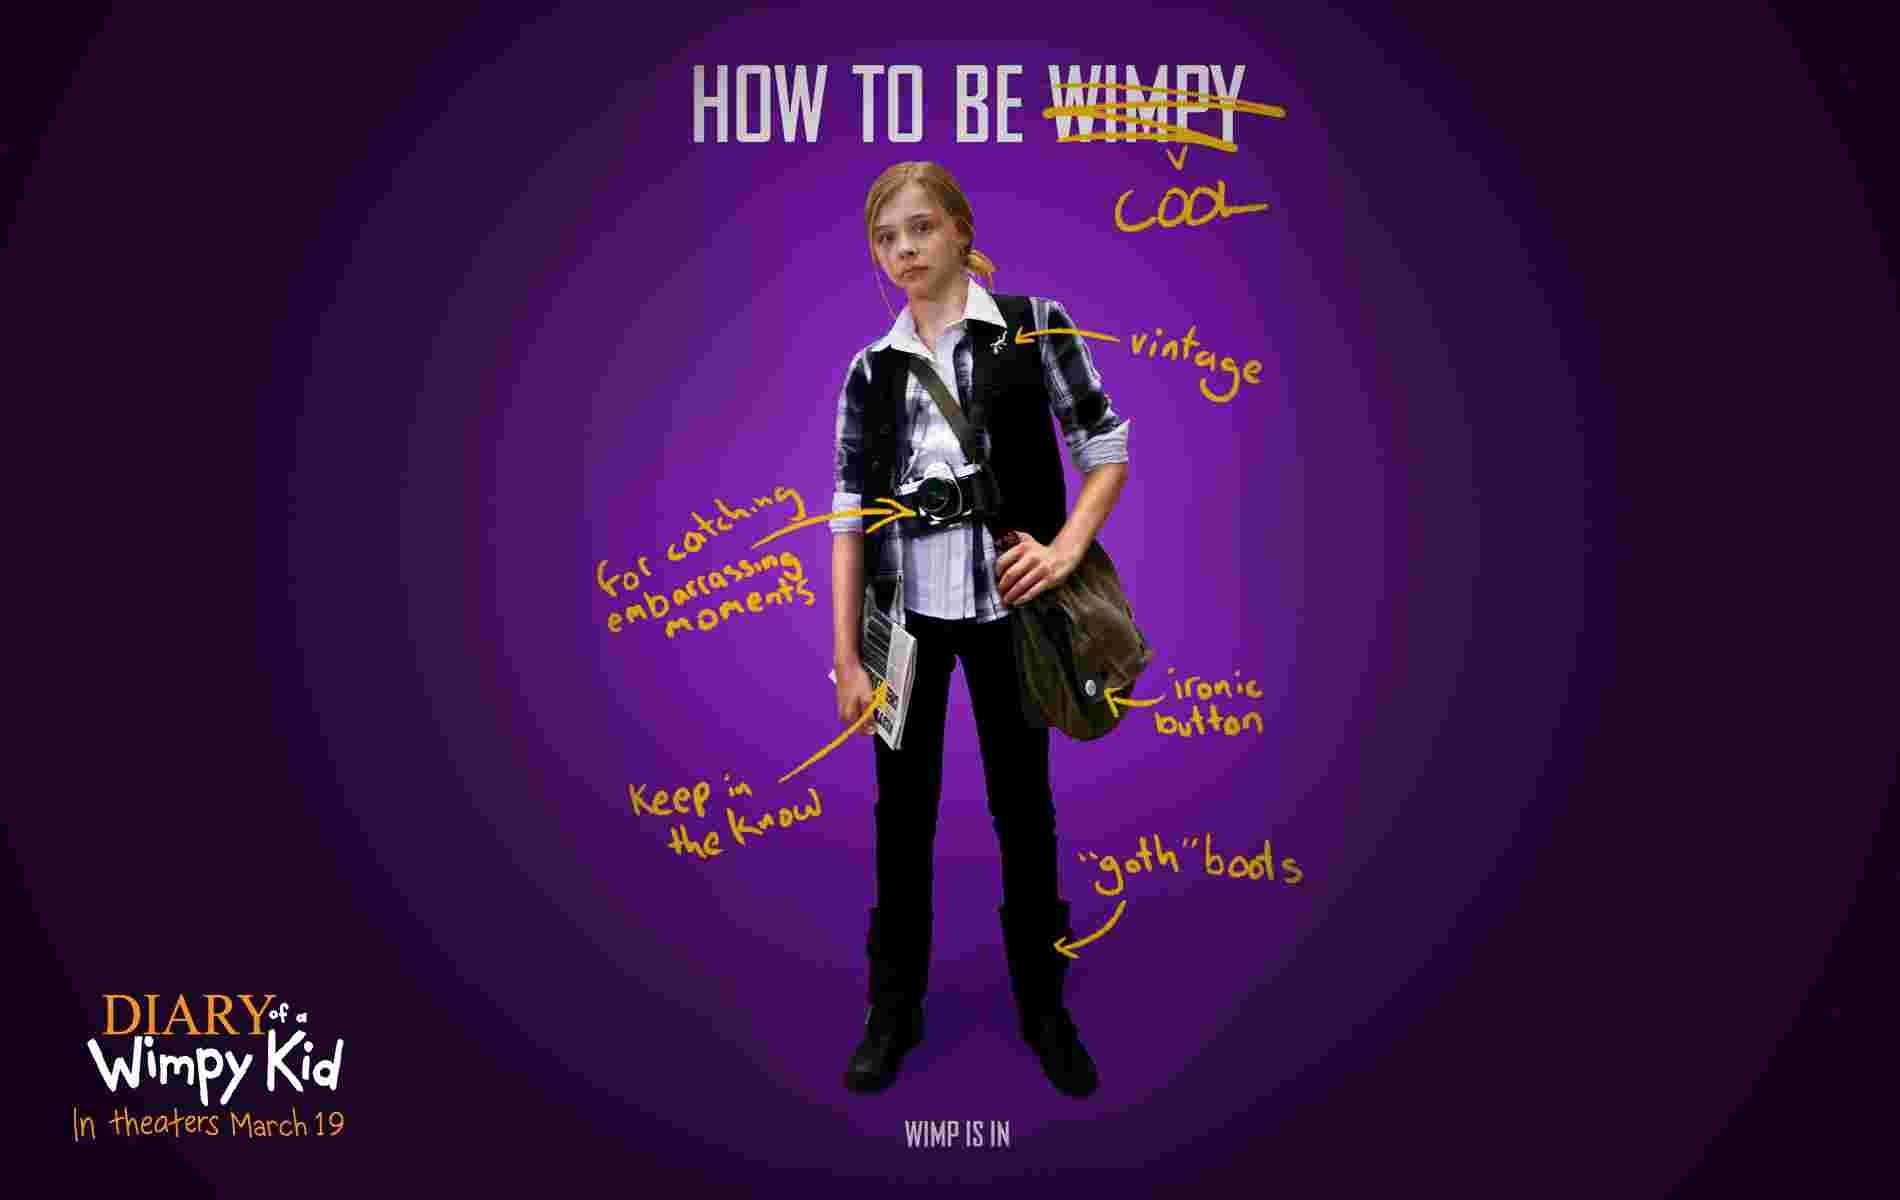 Chloe Moretz Diary Of A Wimpy Kid Chloe Moretz In Diary Of A Wimpy Kid Wallpaper Diary Of A Wimpy Kid Wimpy Kid Wimpy Kid Movie Chloe Grace Moretz